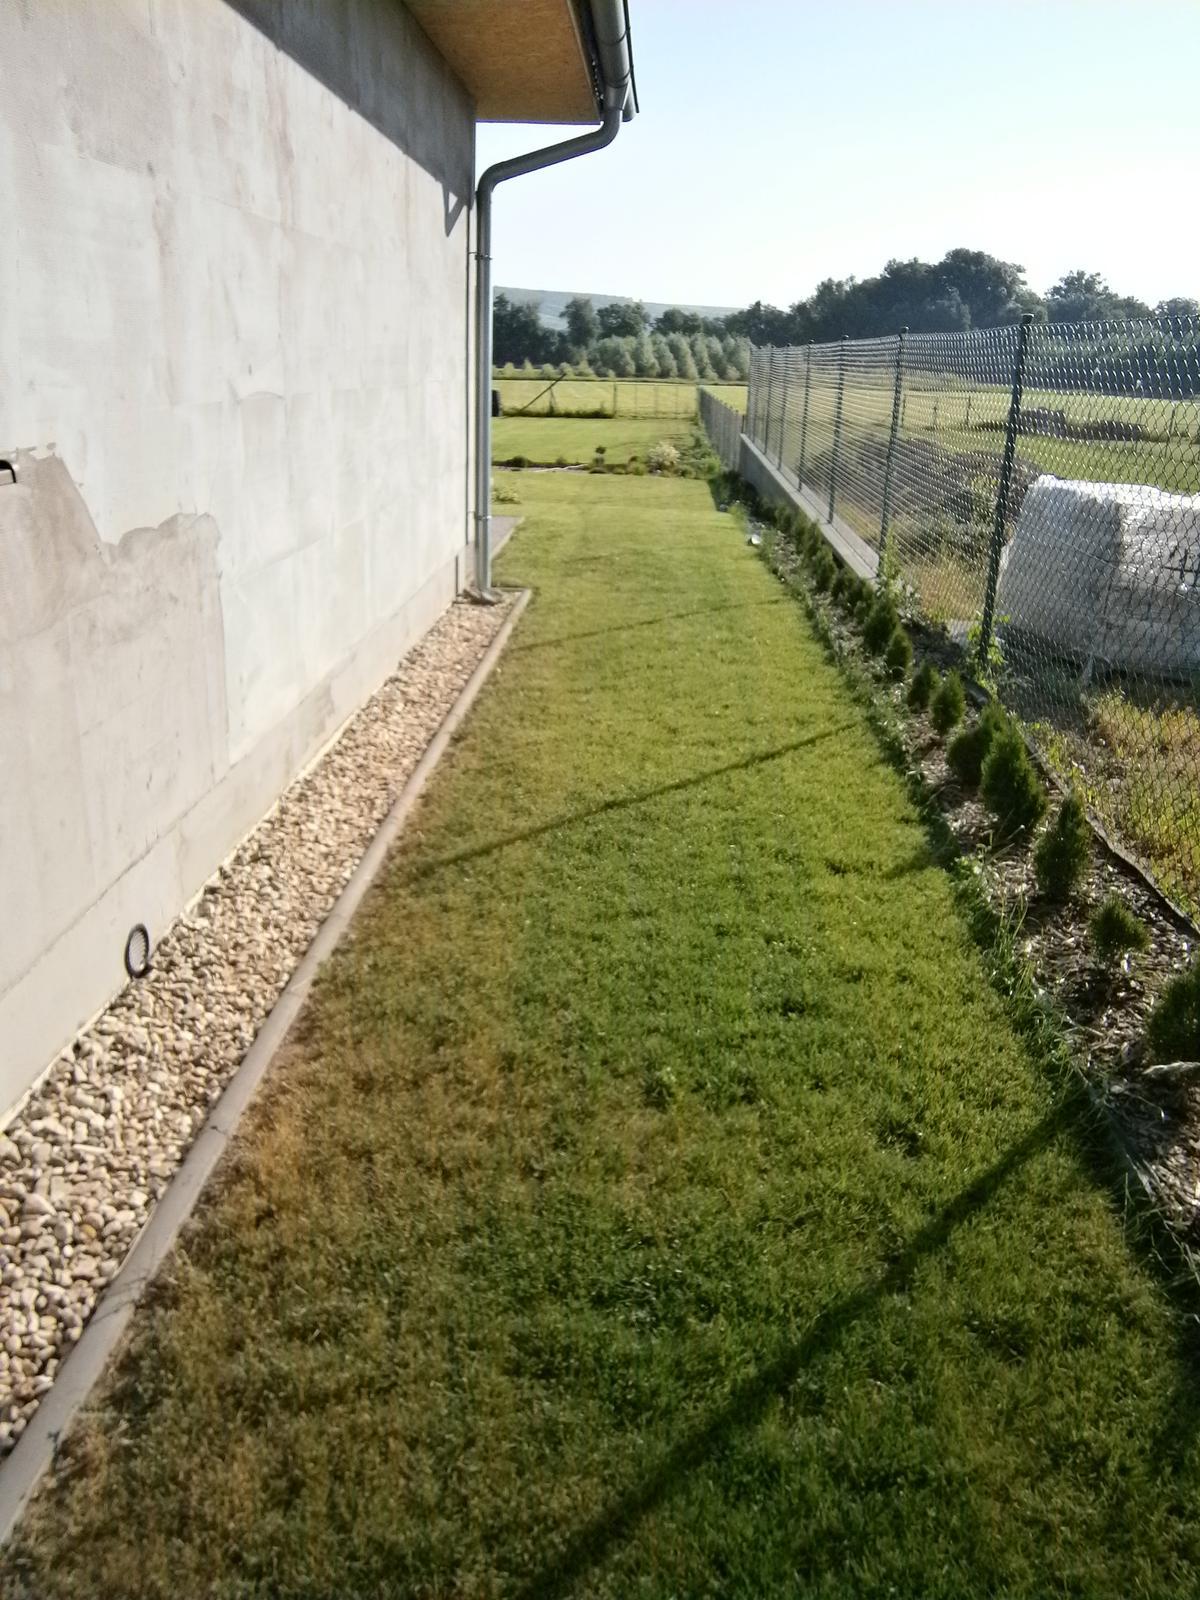 Zahrada a předzahrádka - z pravé strany miny thujky